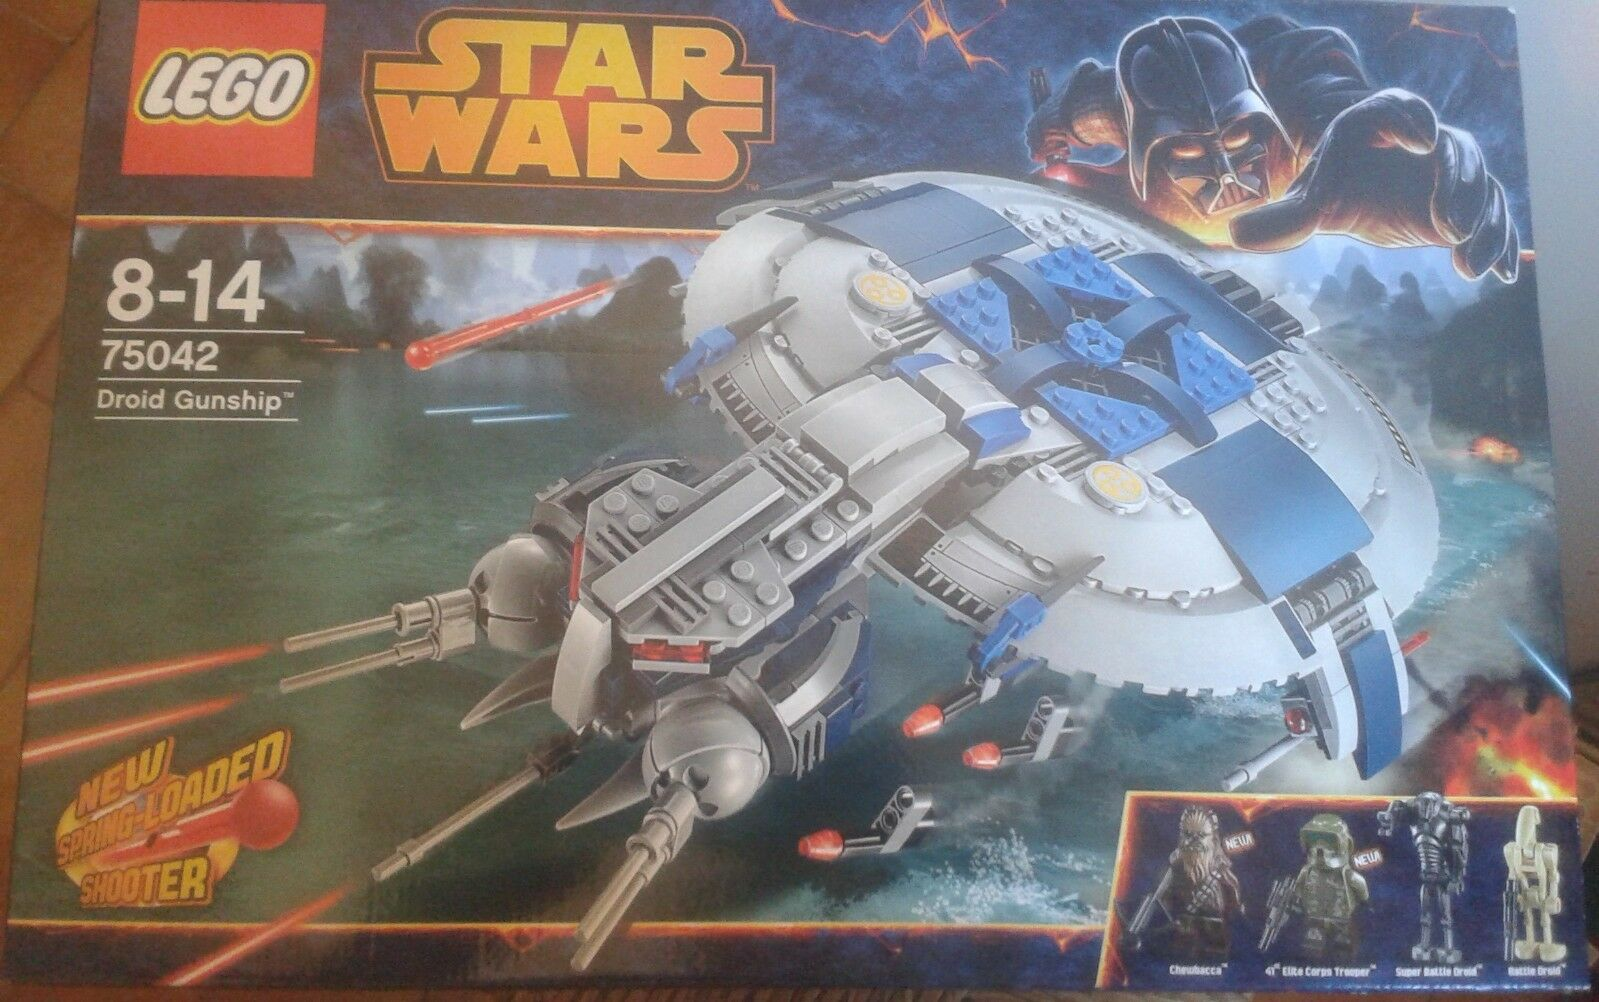 LEGO STAR WARS- 75042-DROID GUNSHIP-NEUF SCELLE-8 14 ANS-TRES SYMPA